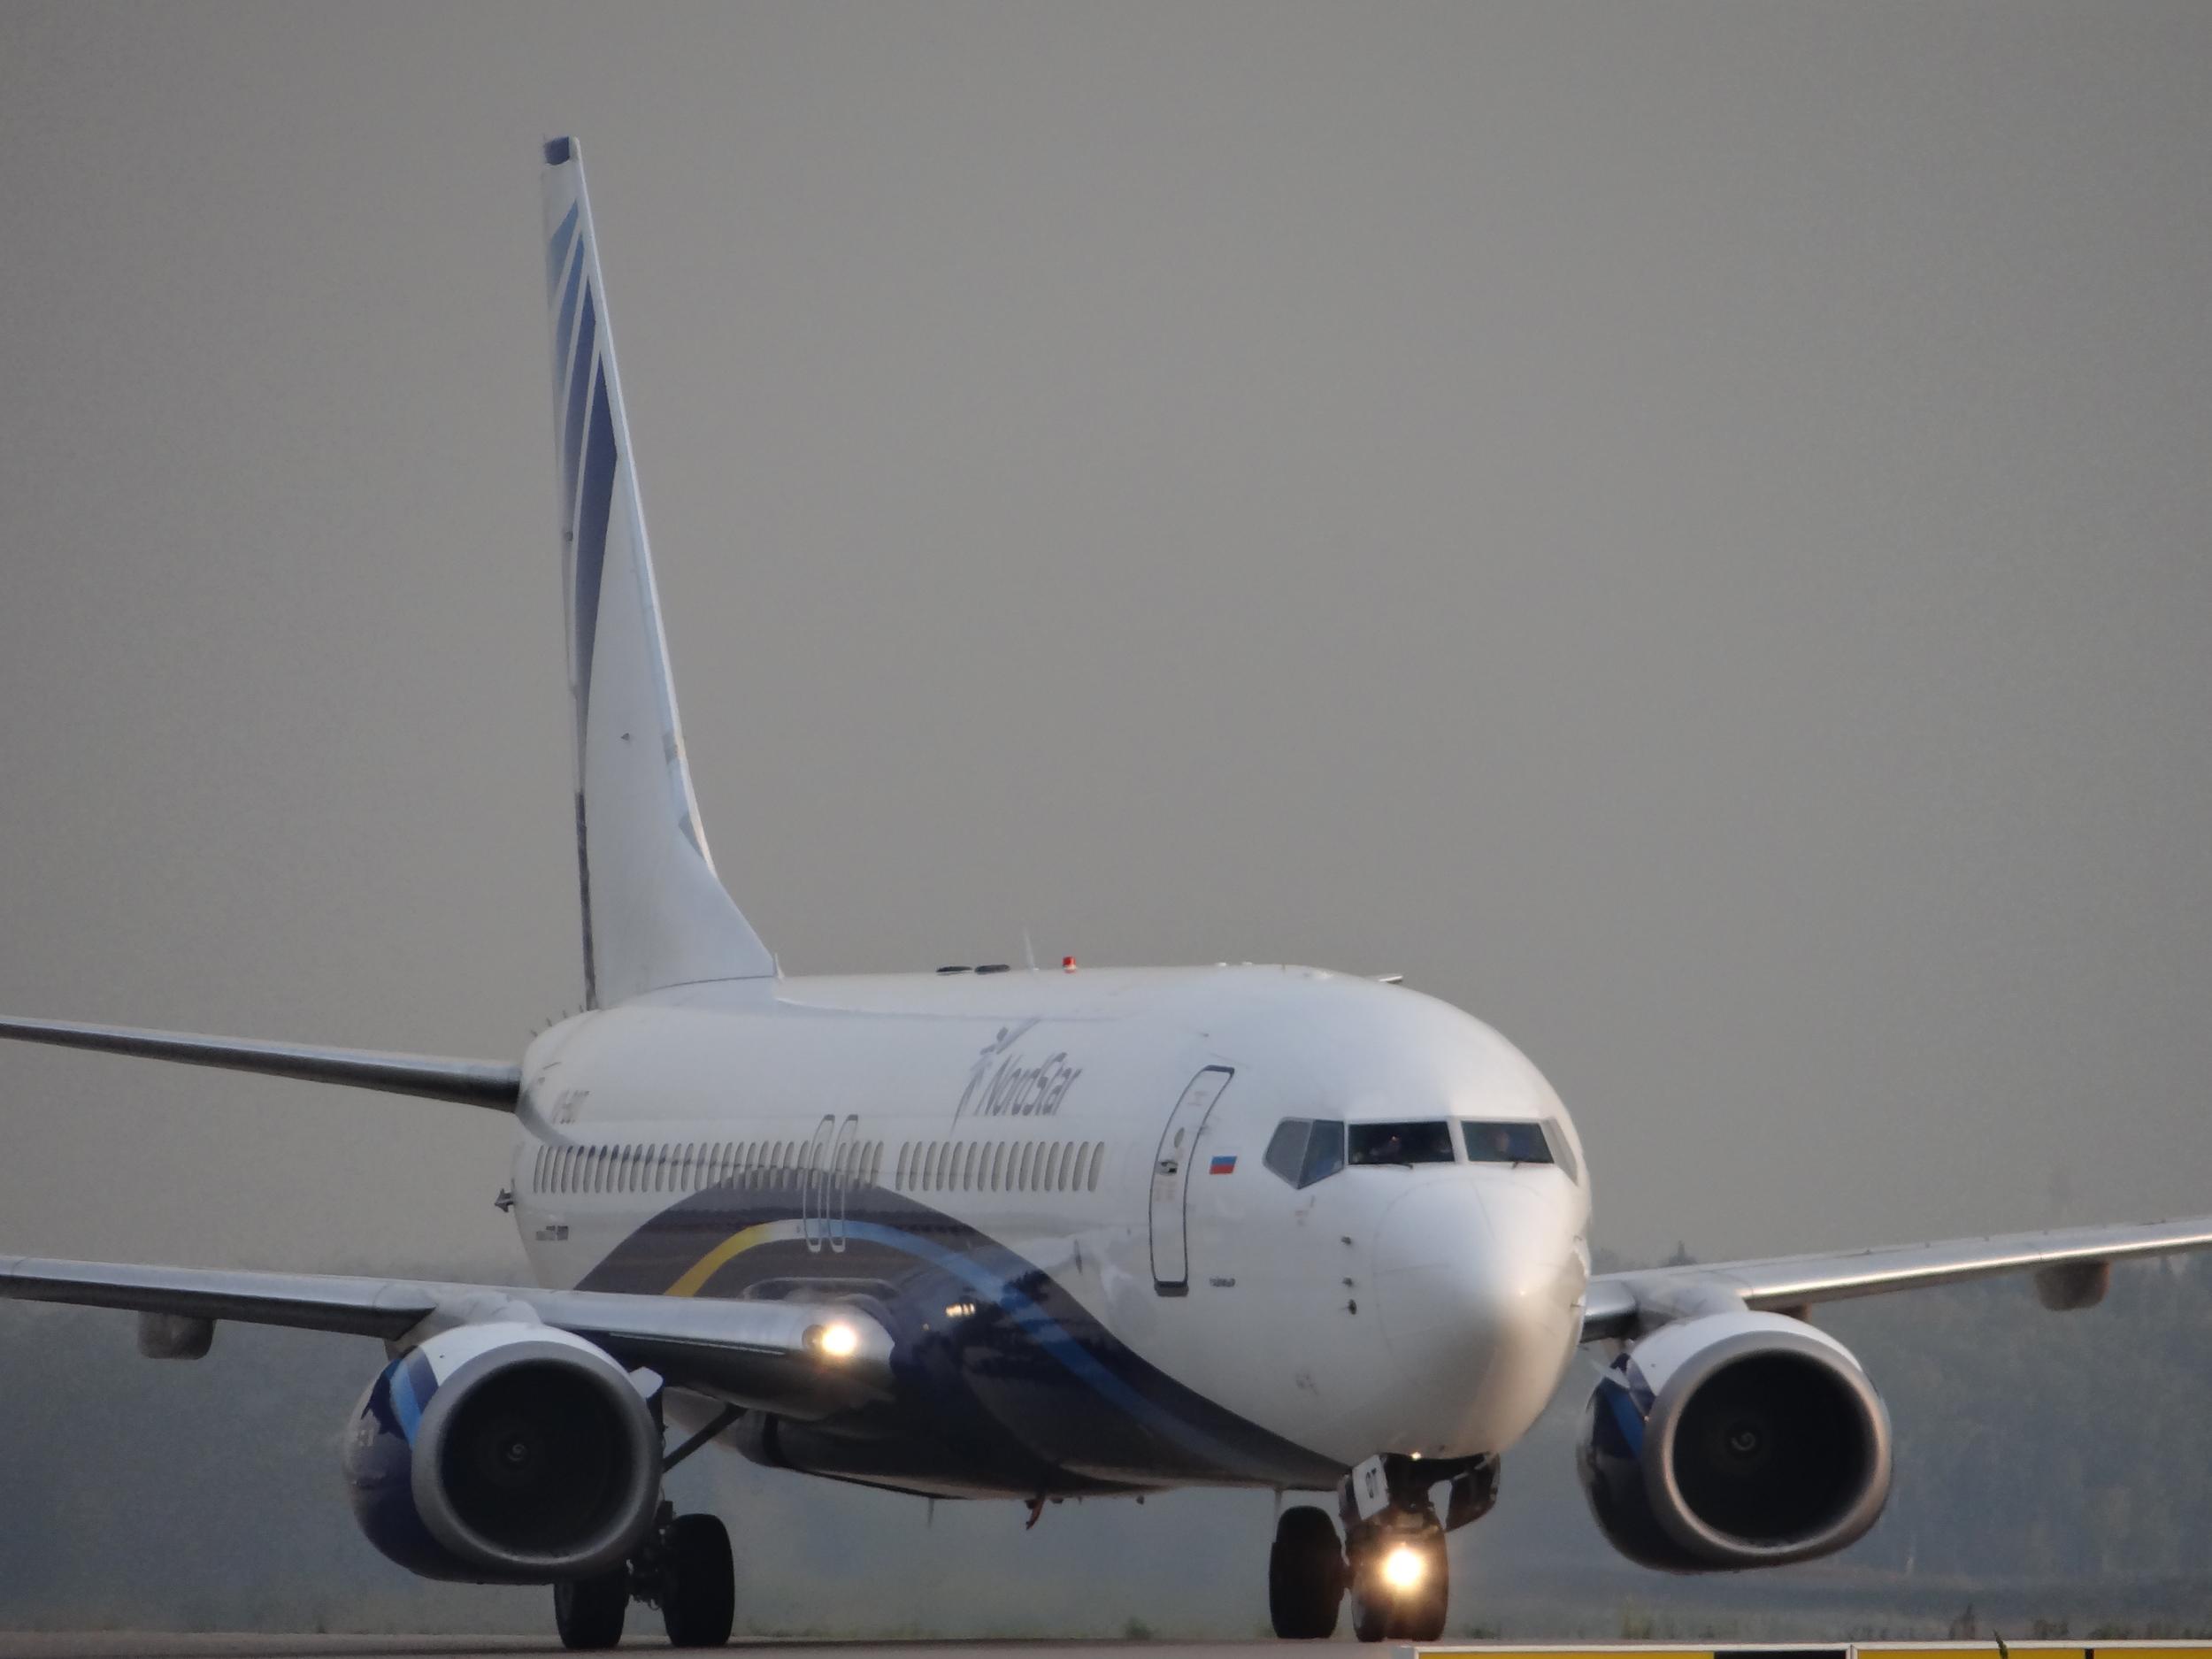 Nordstar Boeing 737 closing up